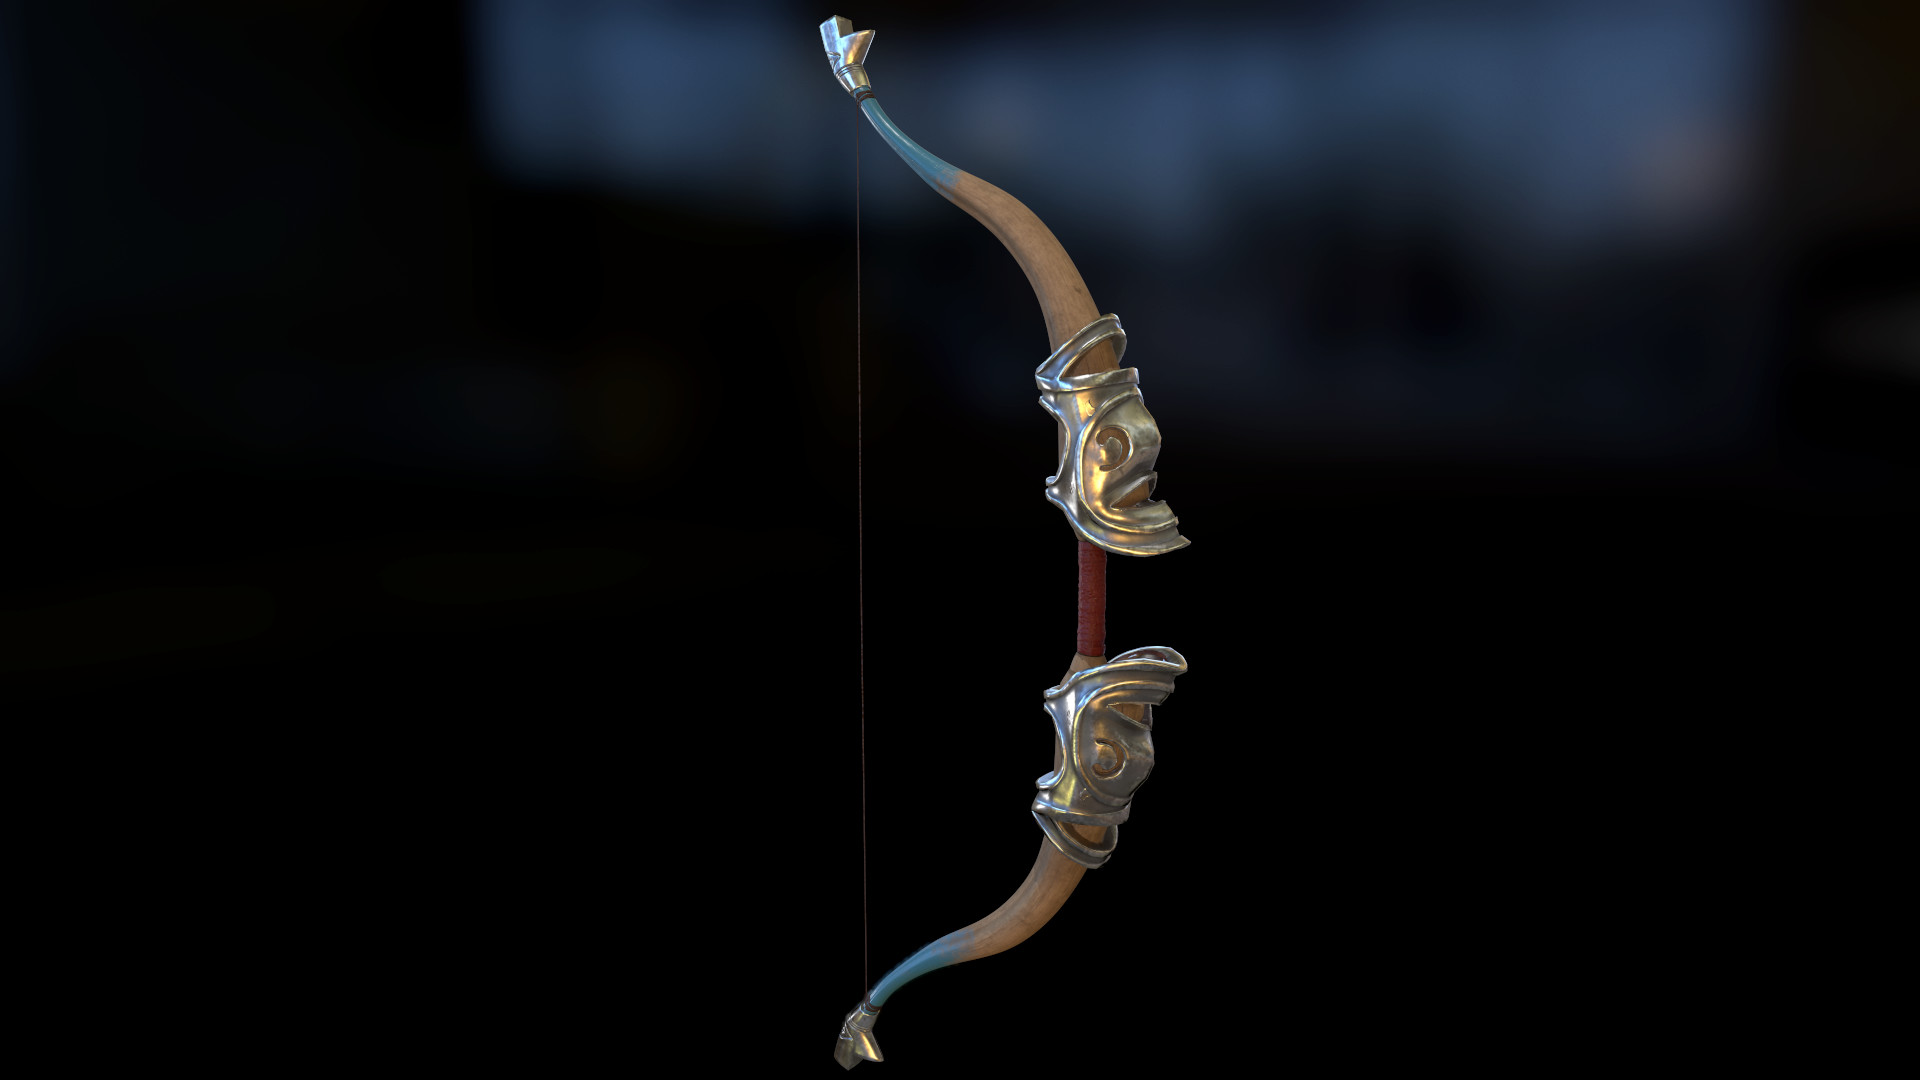 The legend of zelda: link's bow !!!